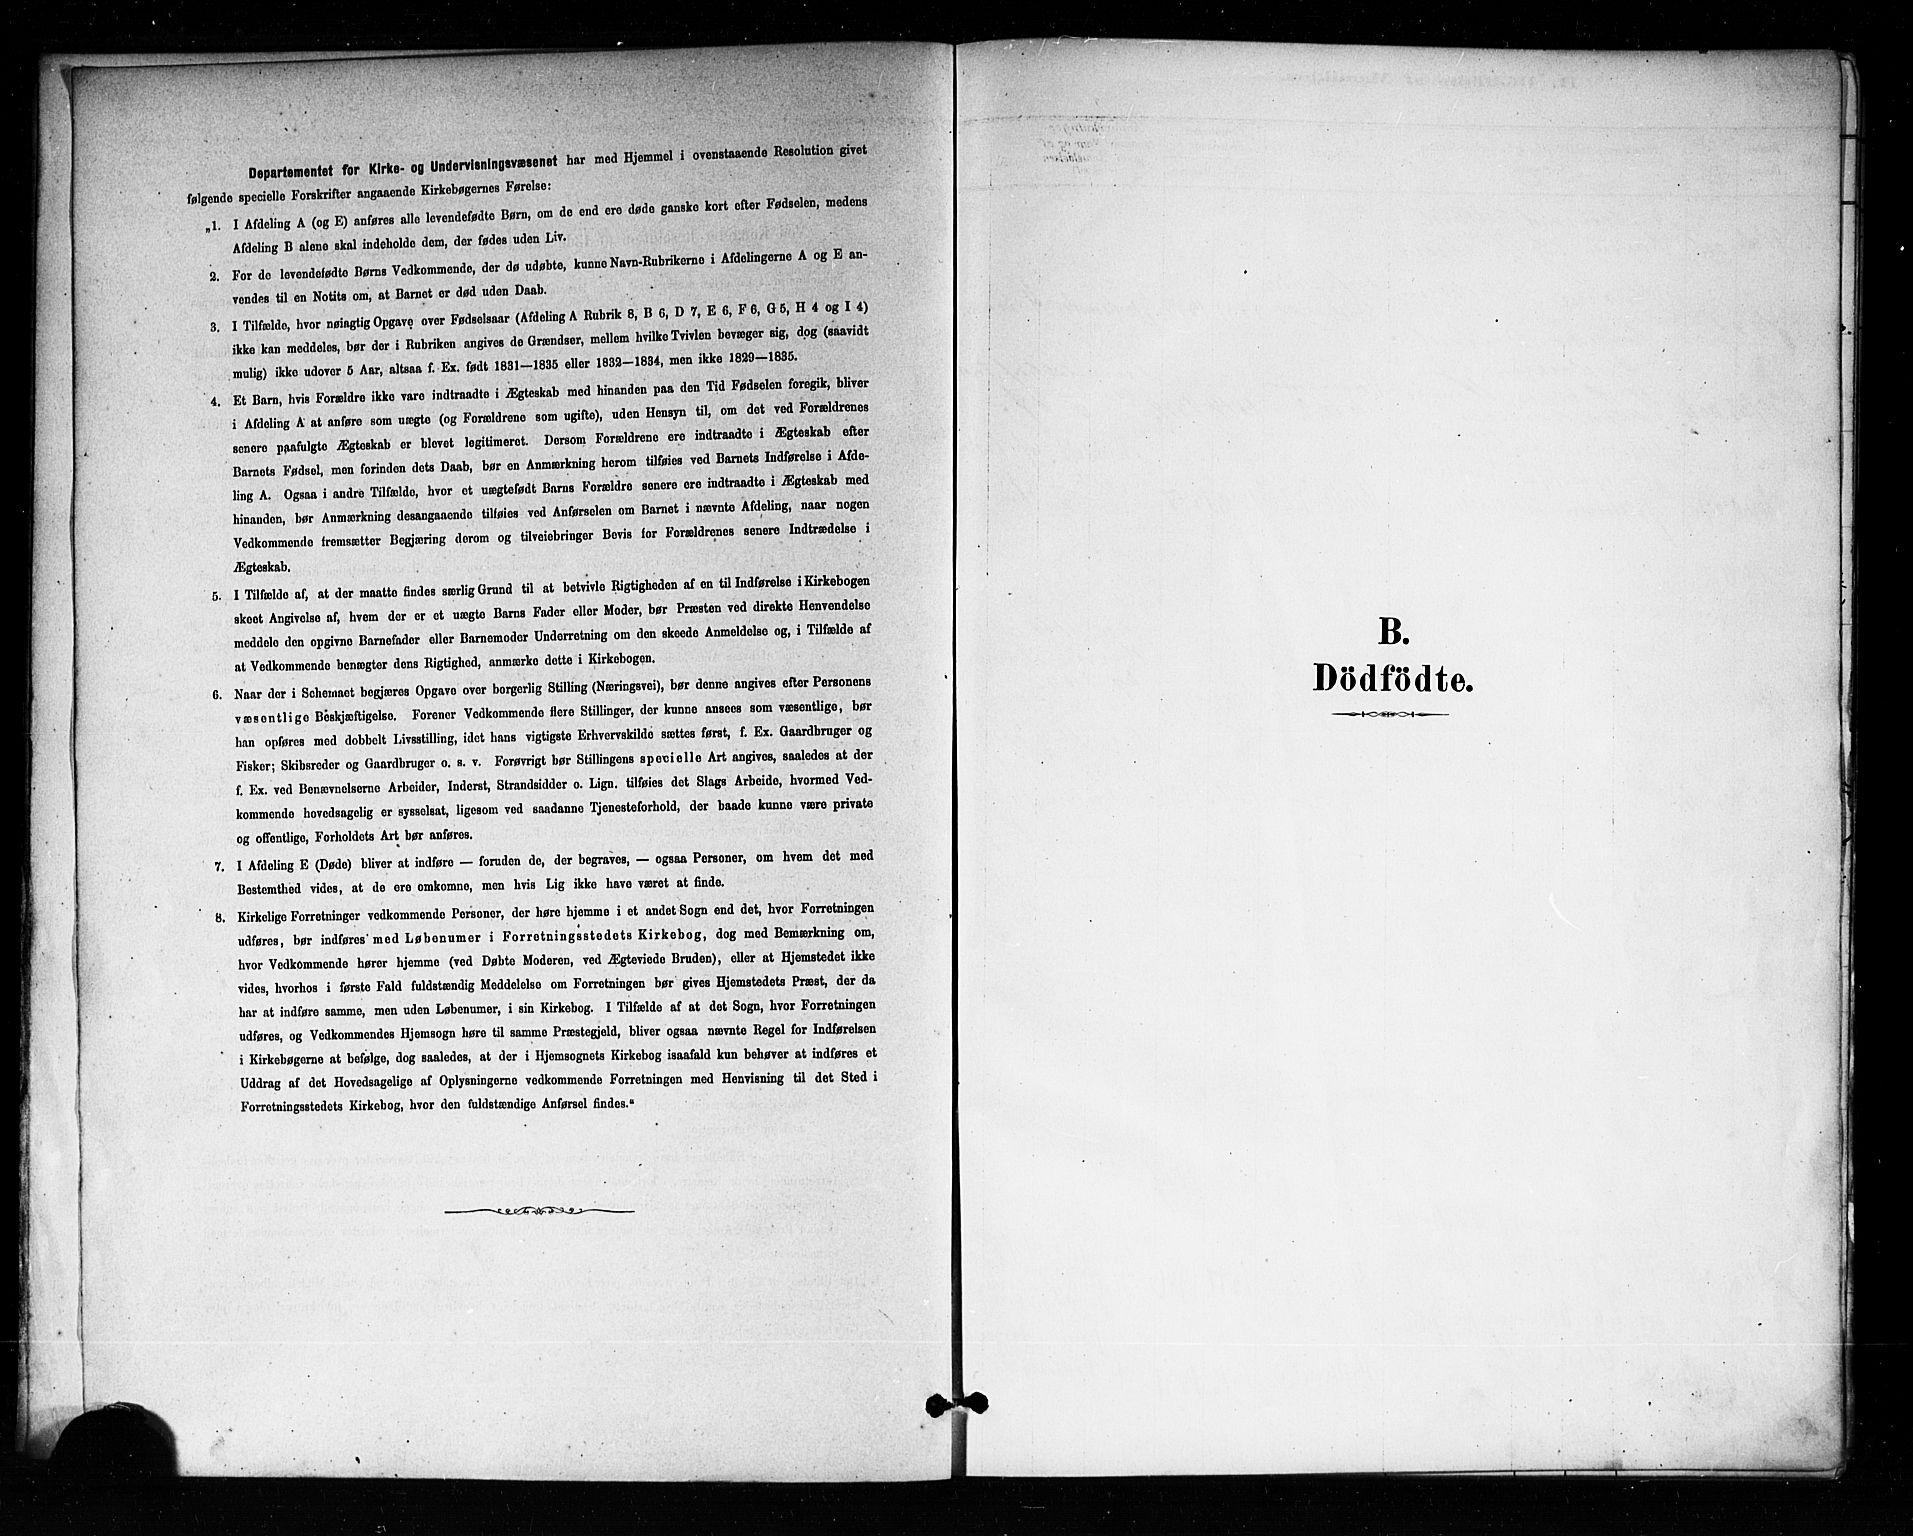 SAO, Uranienborg prestekontor Kirkebøker, F/Fa/L0004: Ministerialbok nr. 4, 1880-1901